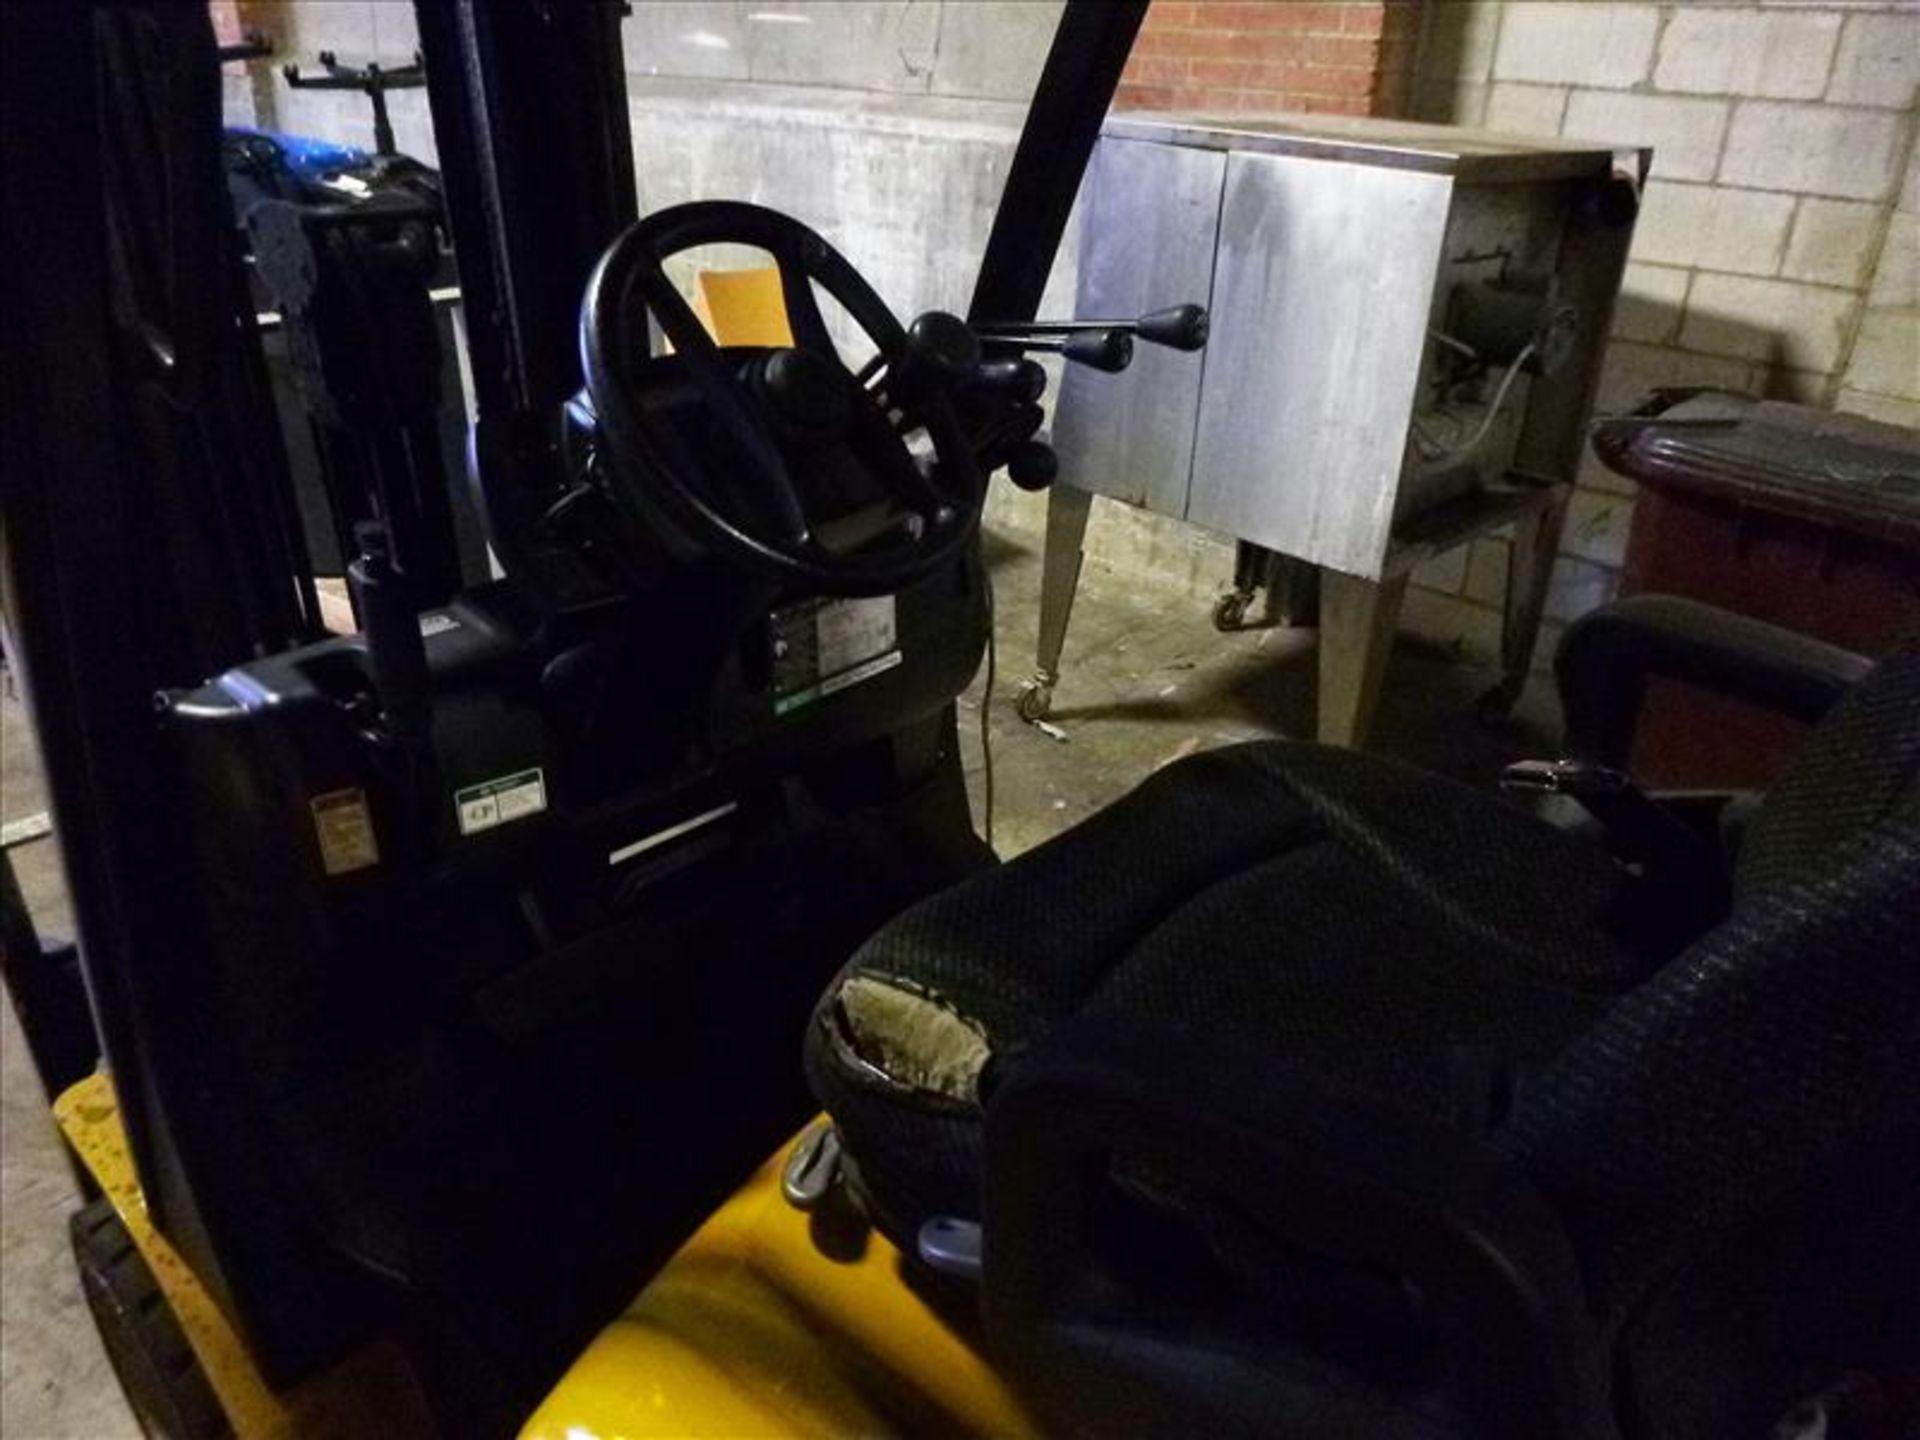 Yale fork lift truck, mod. GLC060VXNDAE085, ser. no. C910V01994N, LPG, 5500 lbs cap., 181 in. lift - Image 3 of 4